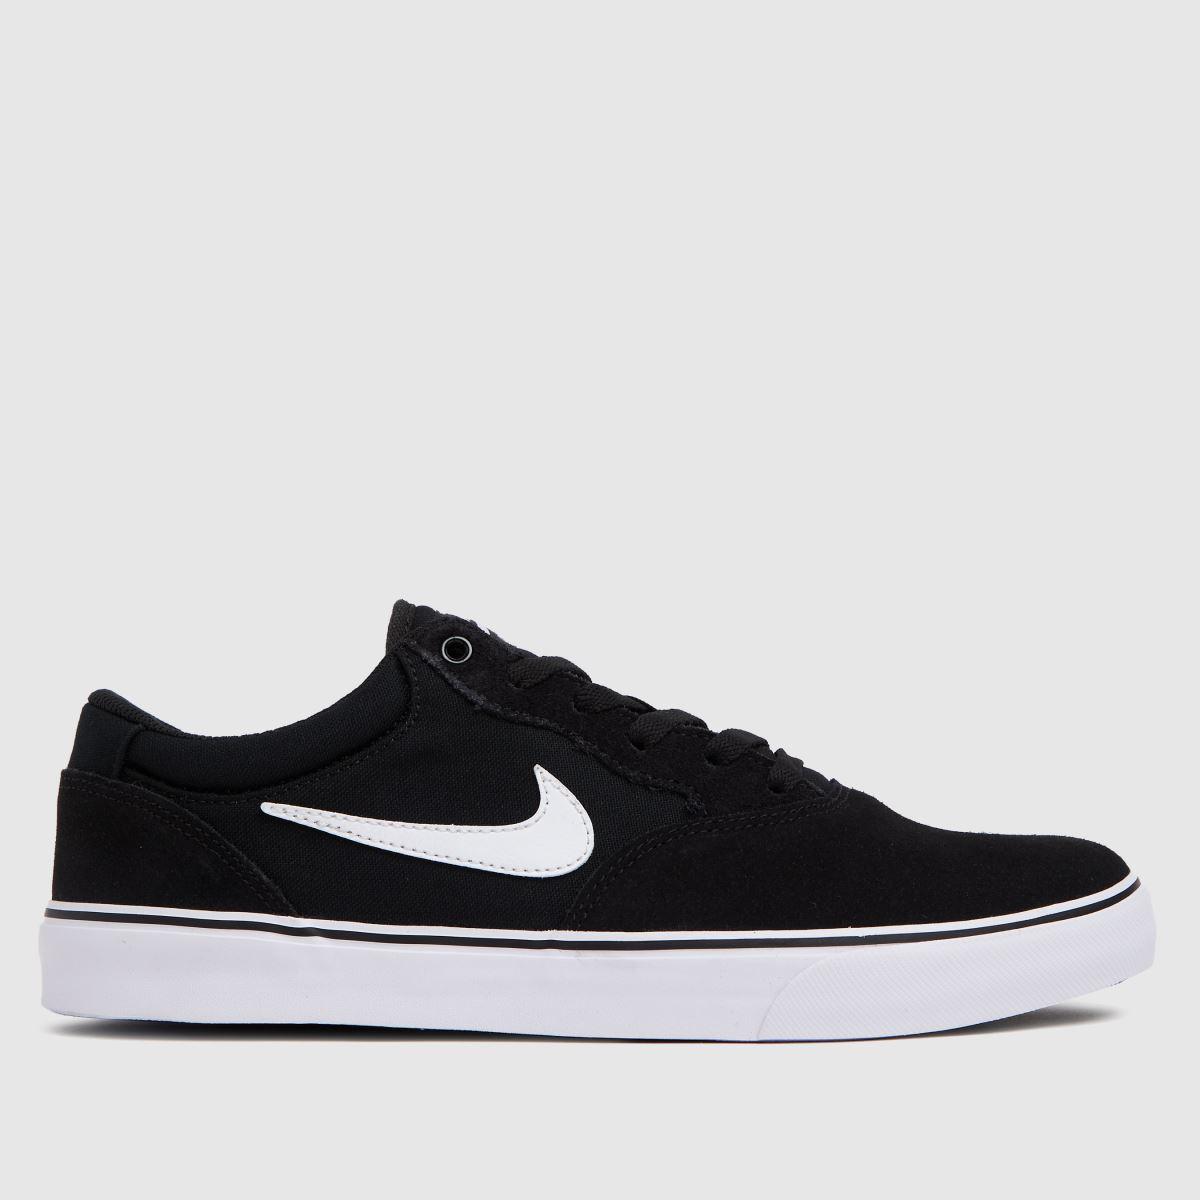 Nike Black & White Chron 2 Trainers